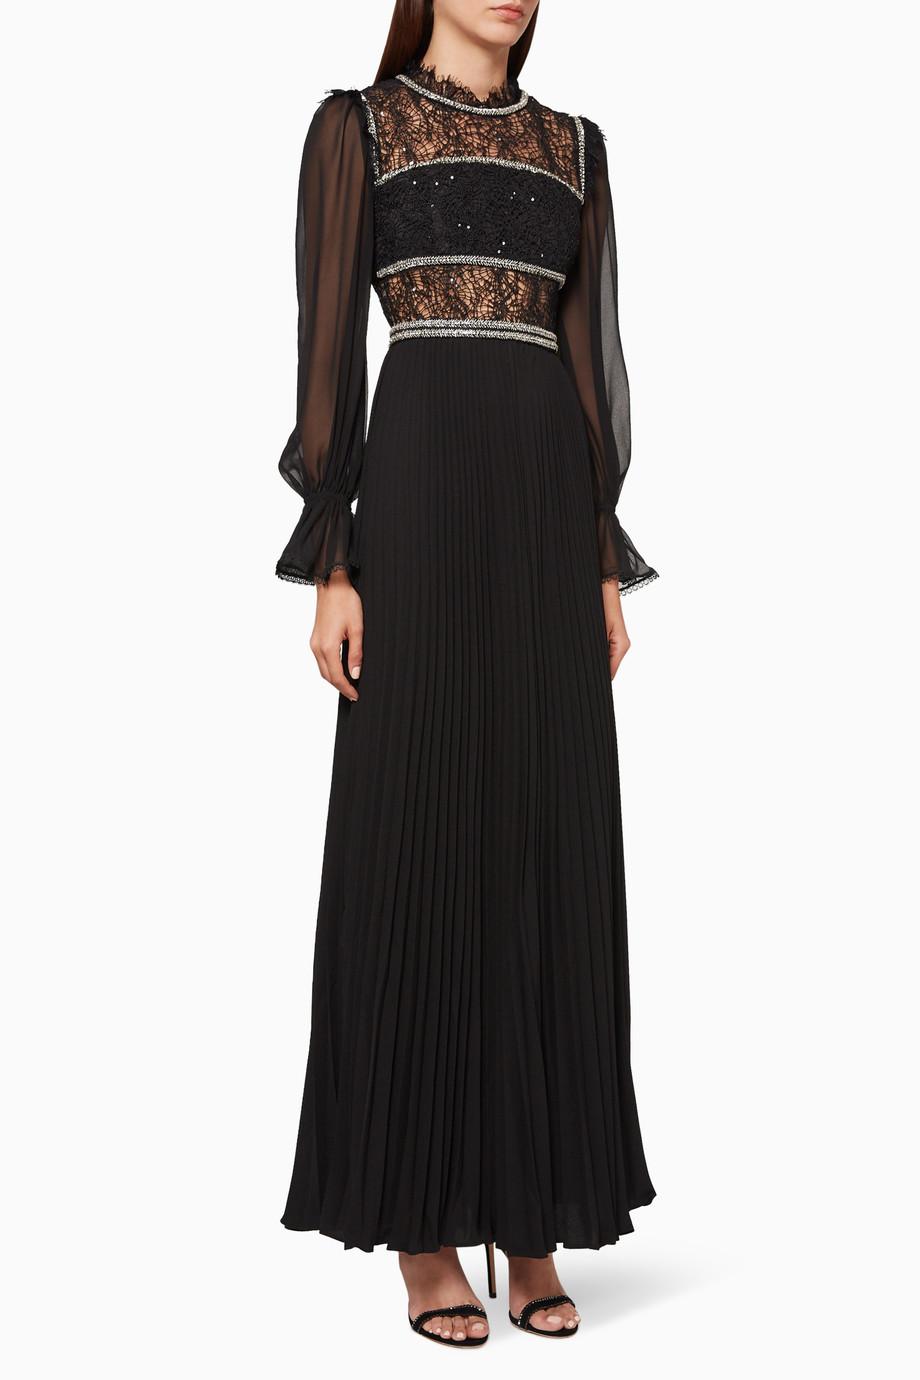 فستان طويل شيفون ودانتيل بتصميم دوائر مطرزة بترتر